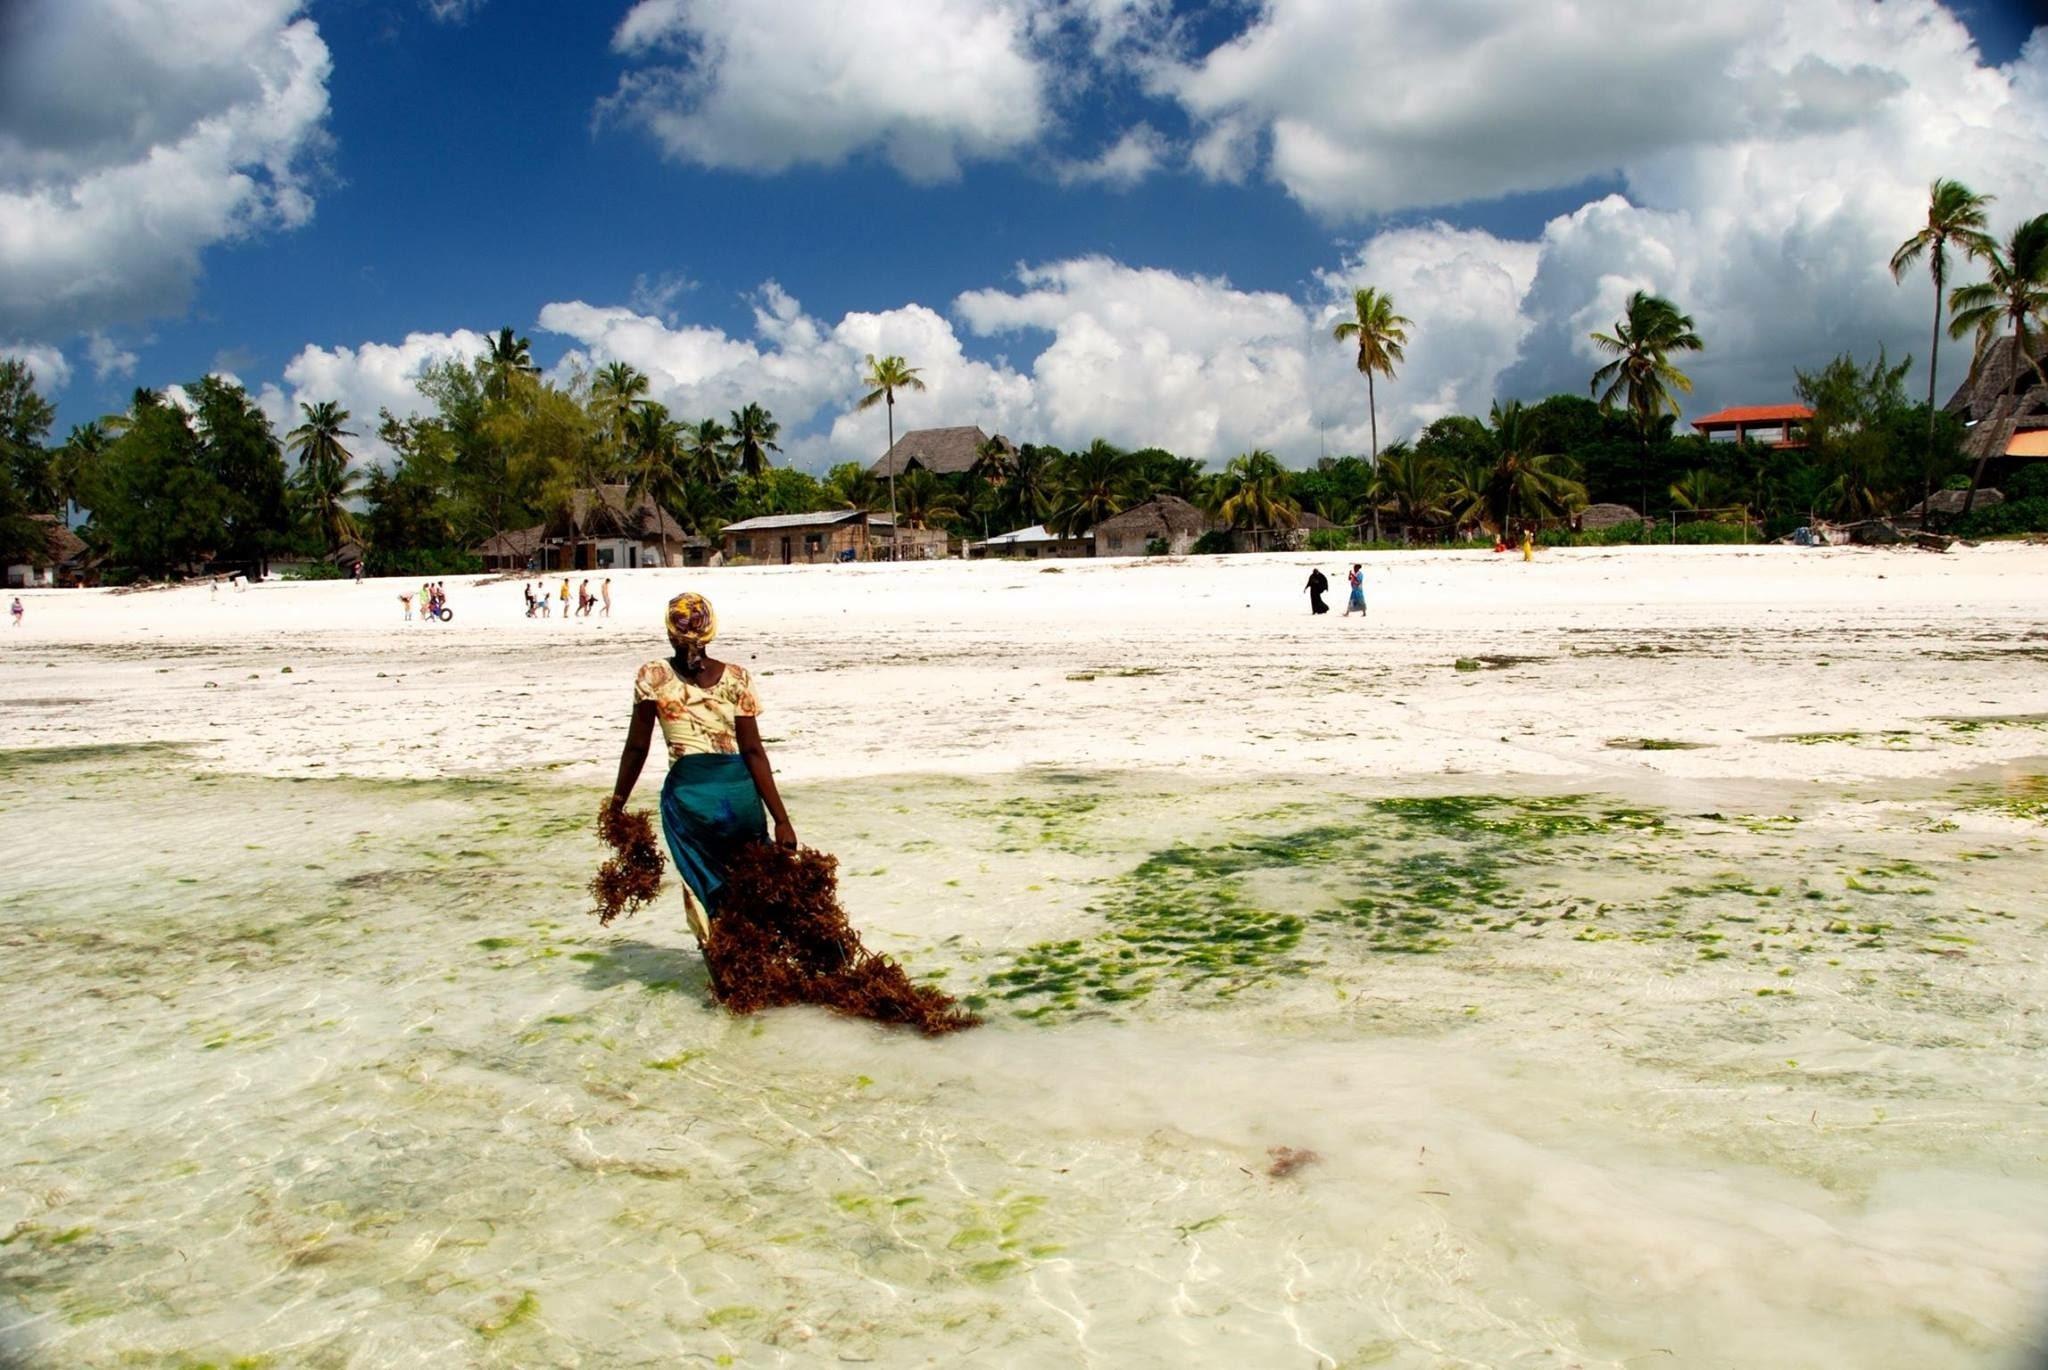 Cultivating seaweed - Zanzibar, Tanzania Africa